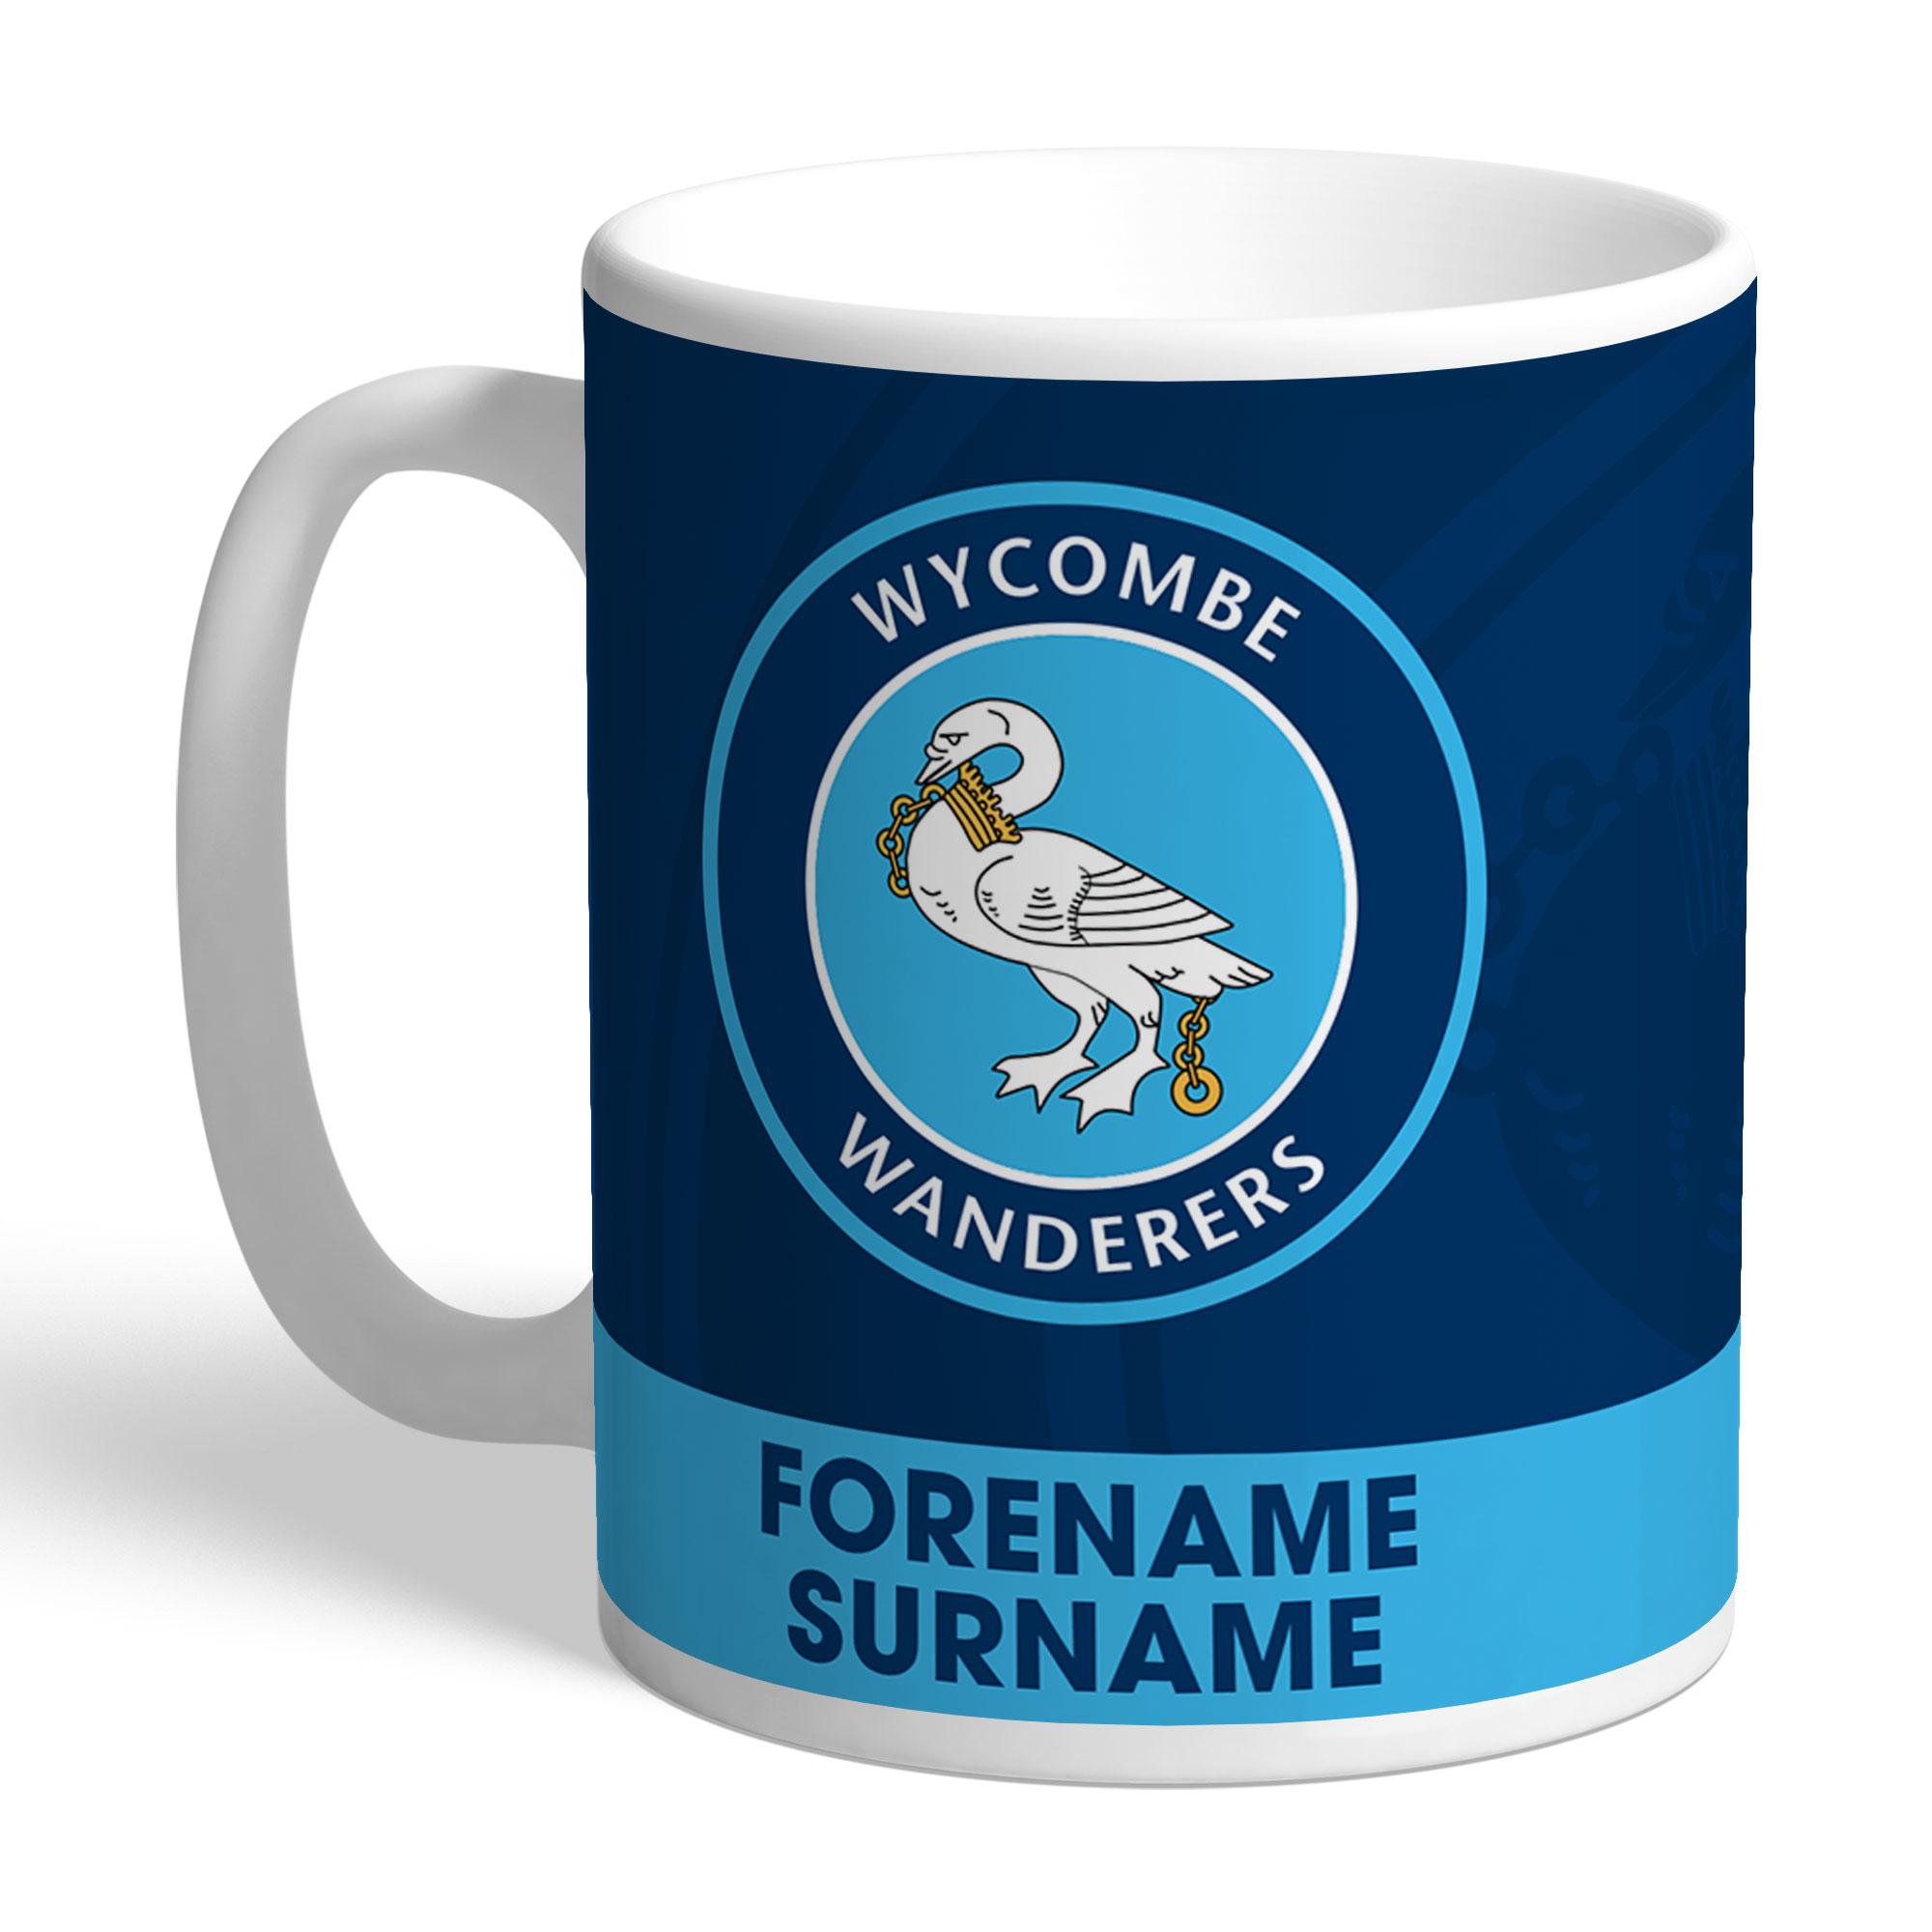 Wycombe Wanderers Bold Crest Mug